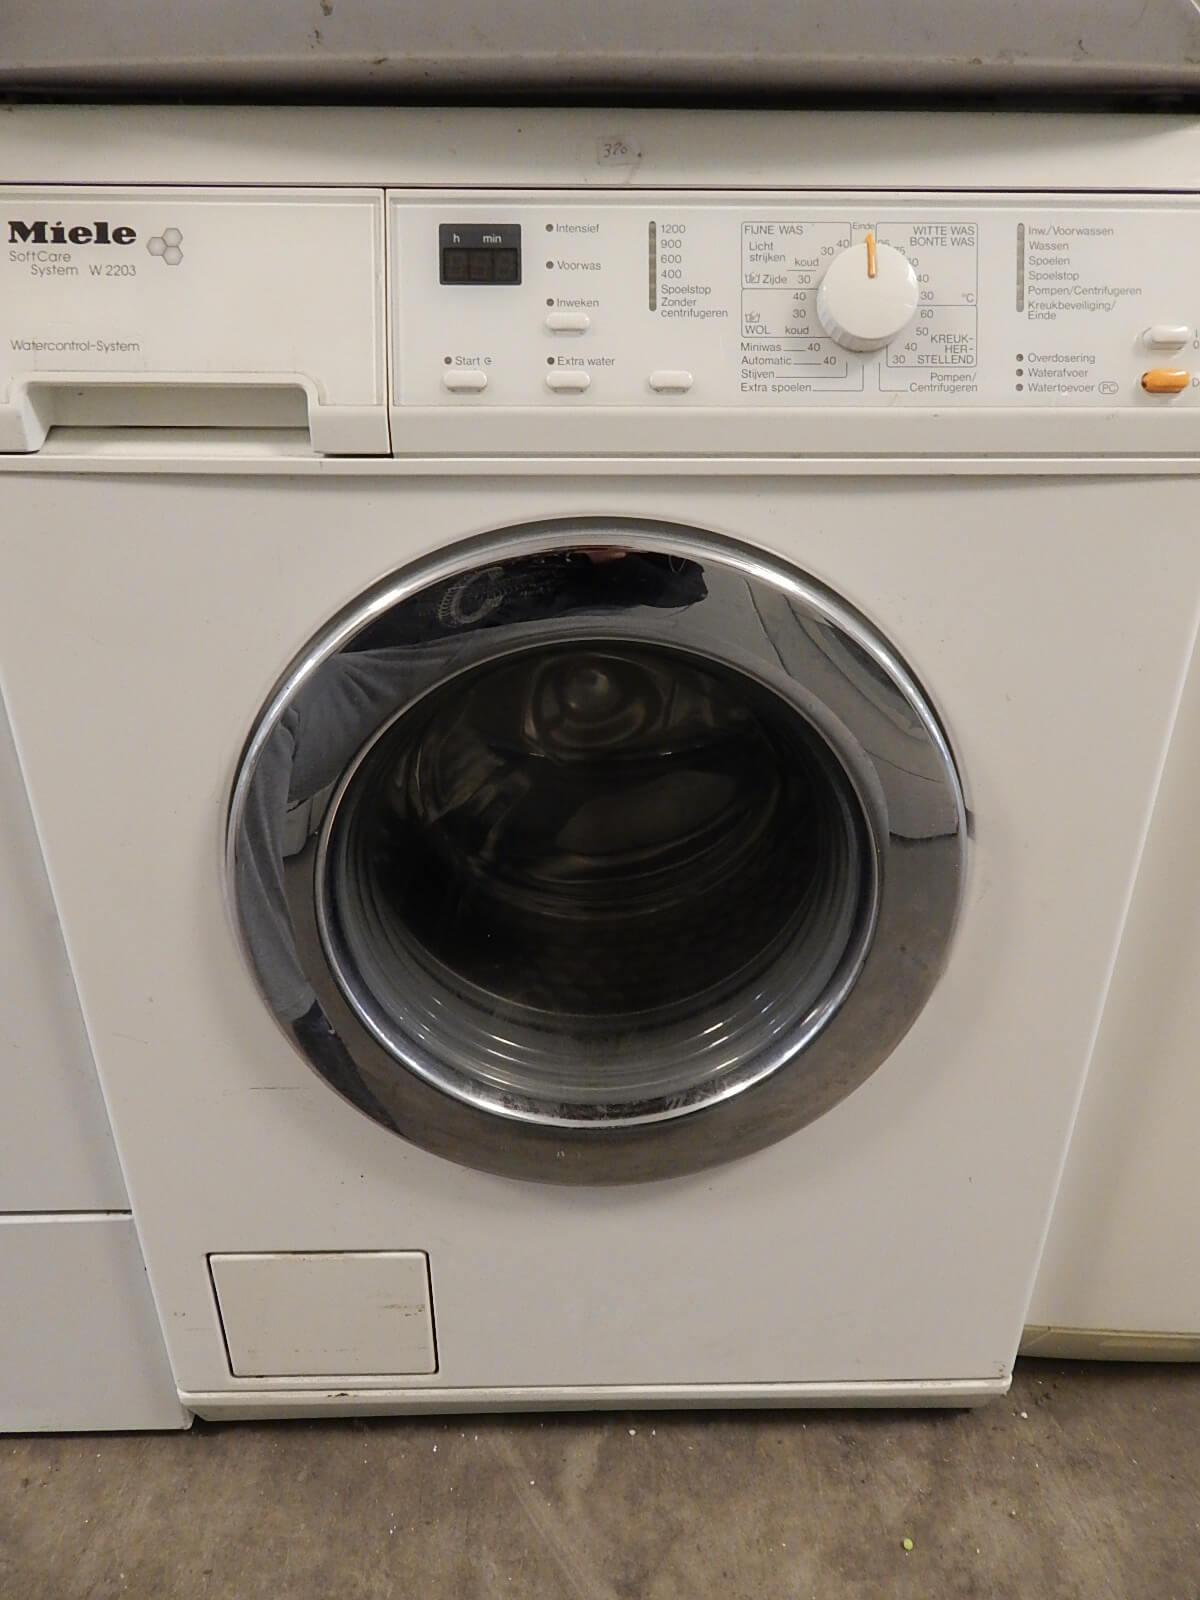 Tweedehands Miele wasmachine